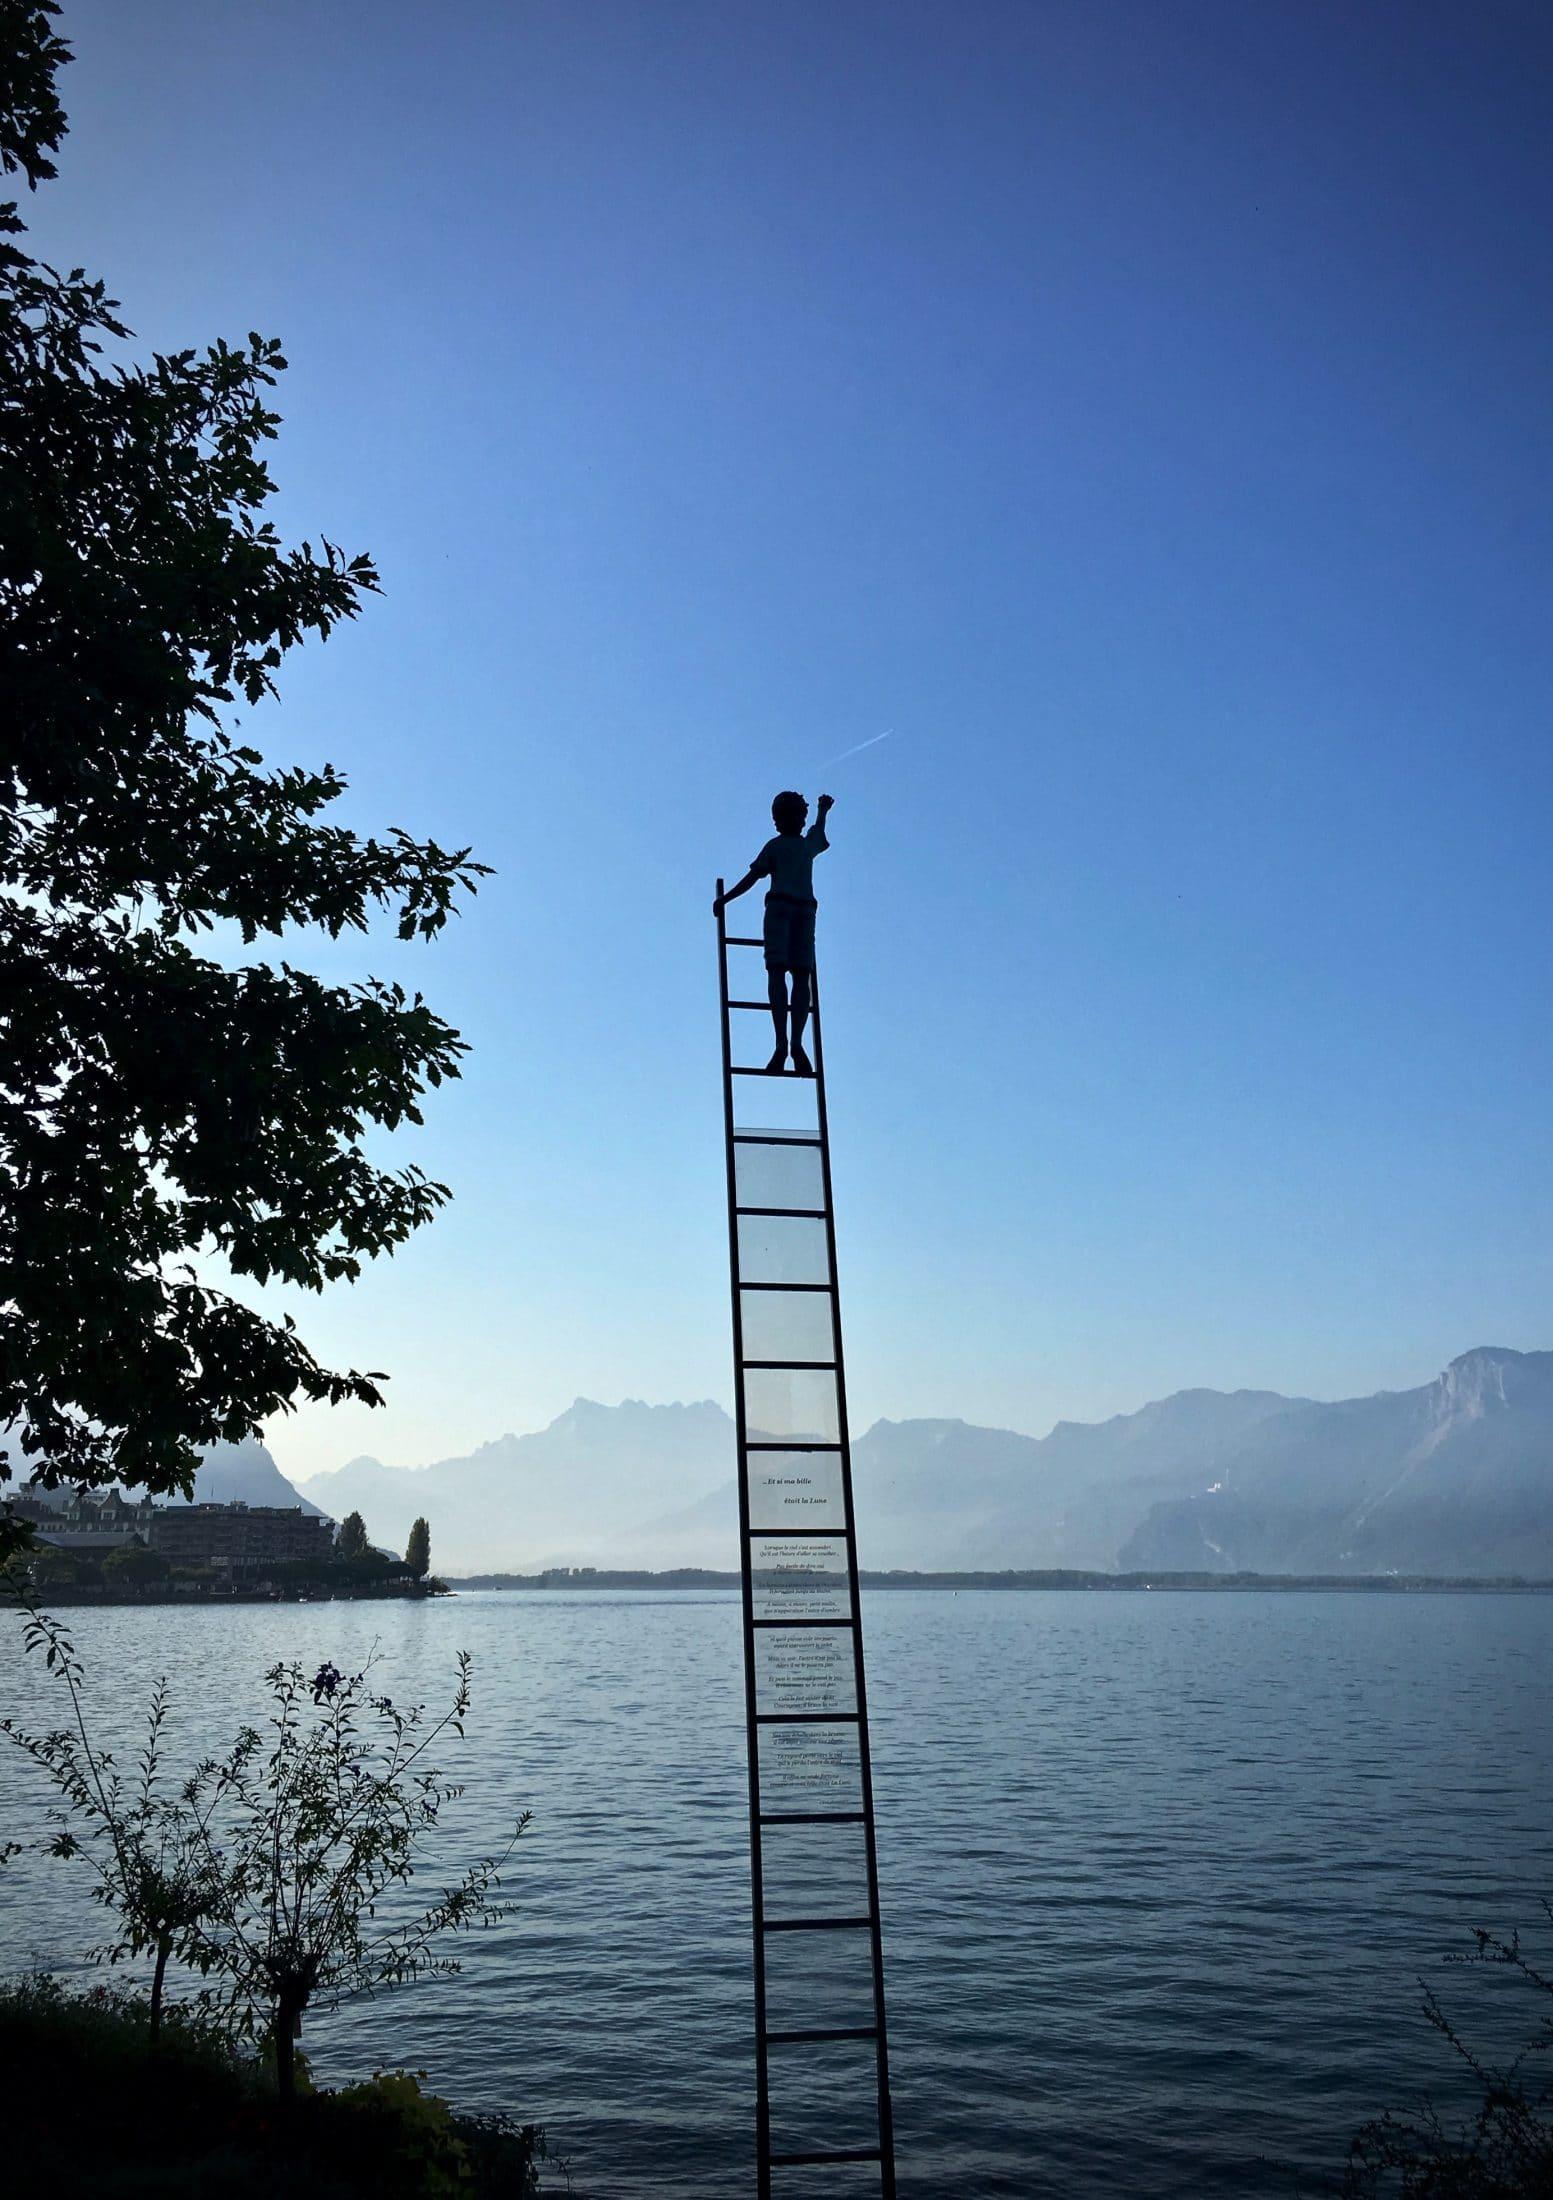 A young person climbing a ladder to reach their goals